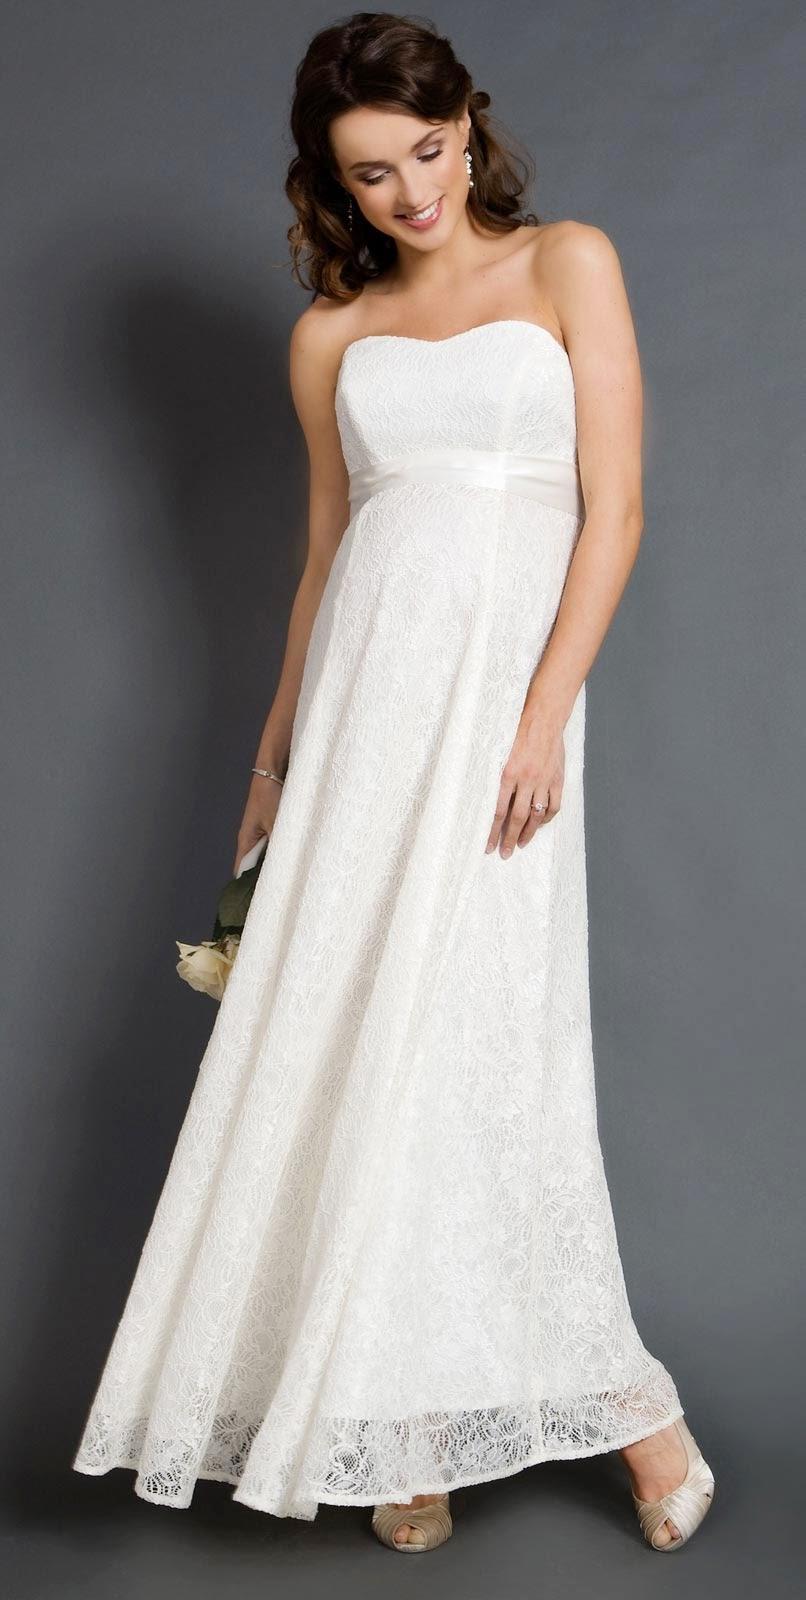 Designer White Maternity Beach Wedding Dresses Without